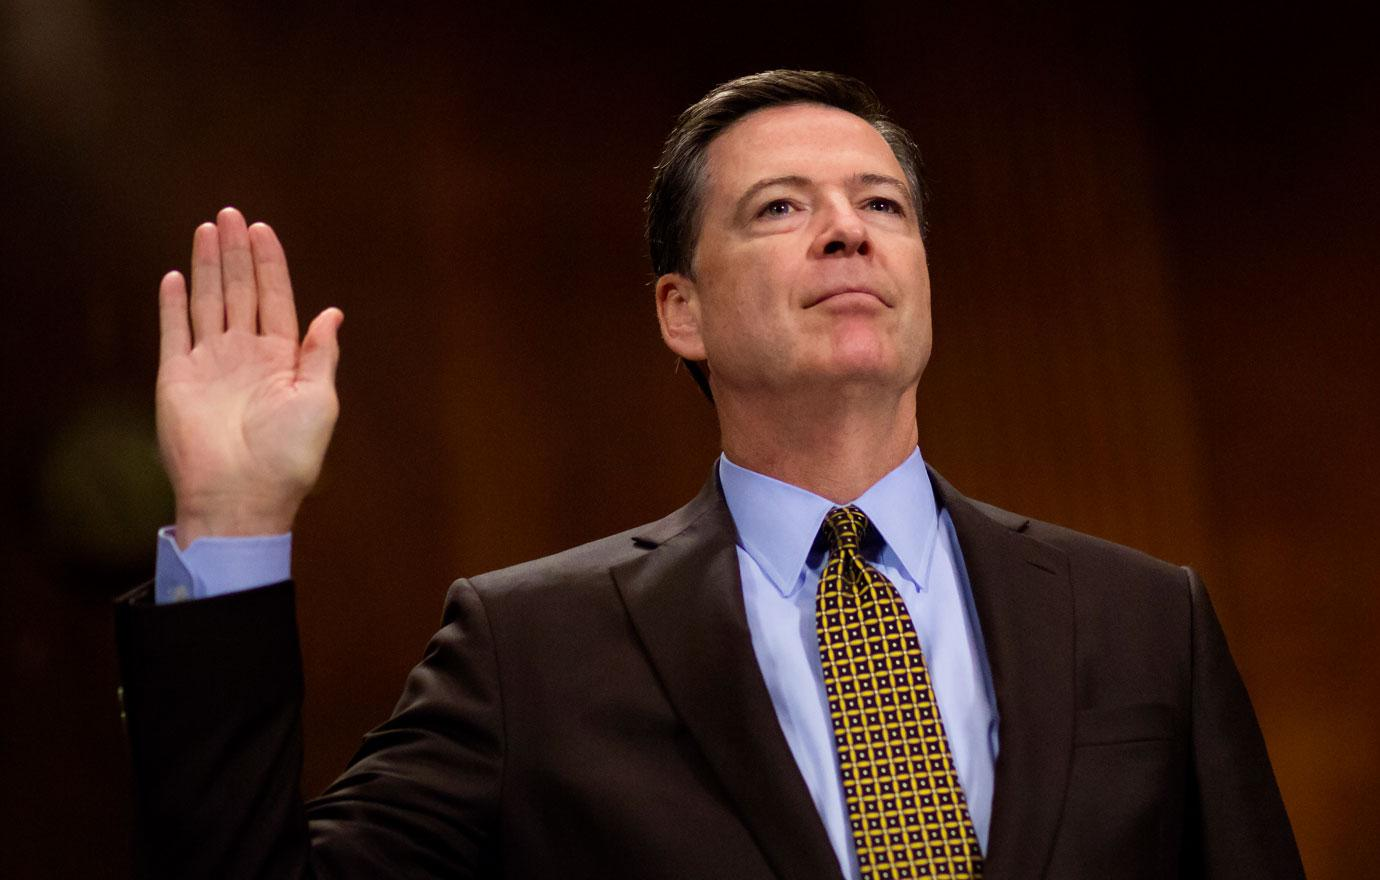 James Comey Testimony Hillary Clinton Emails Huma Abedin